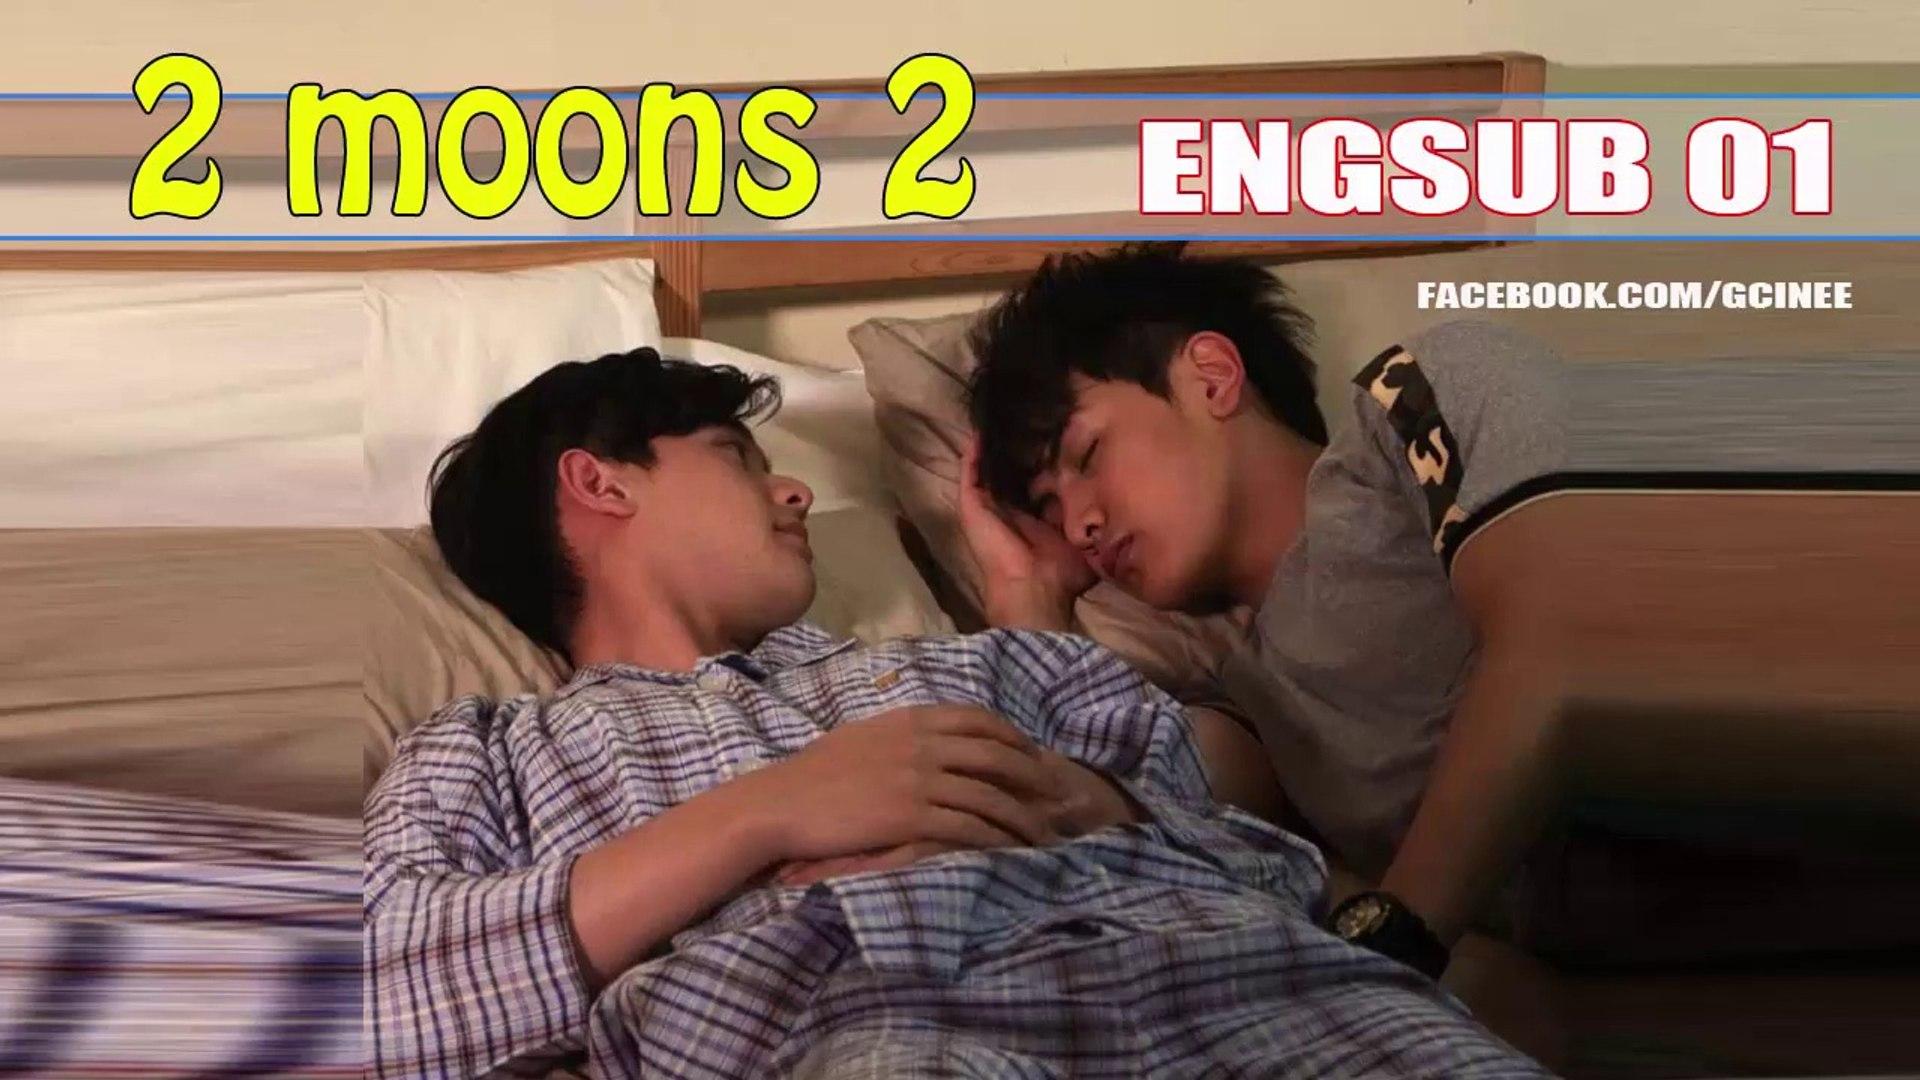 ENGSUB 01 - 2 MOONS 2 THE SERIES